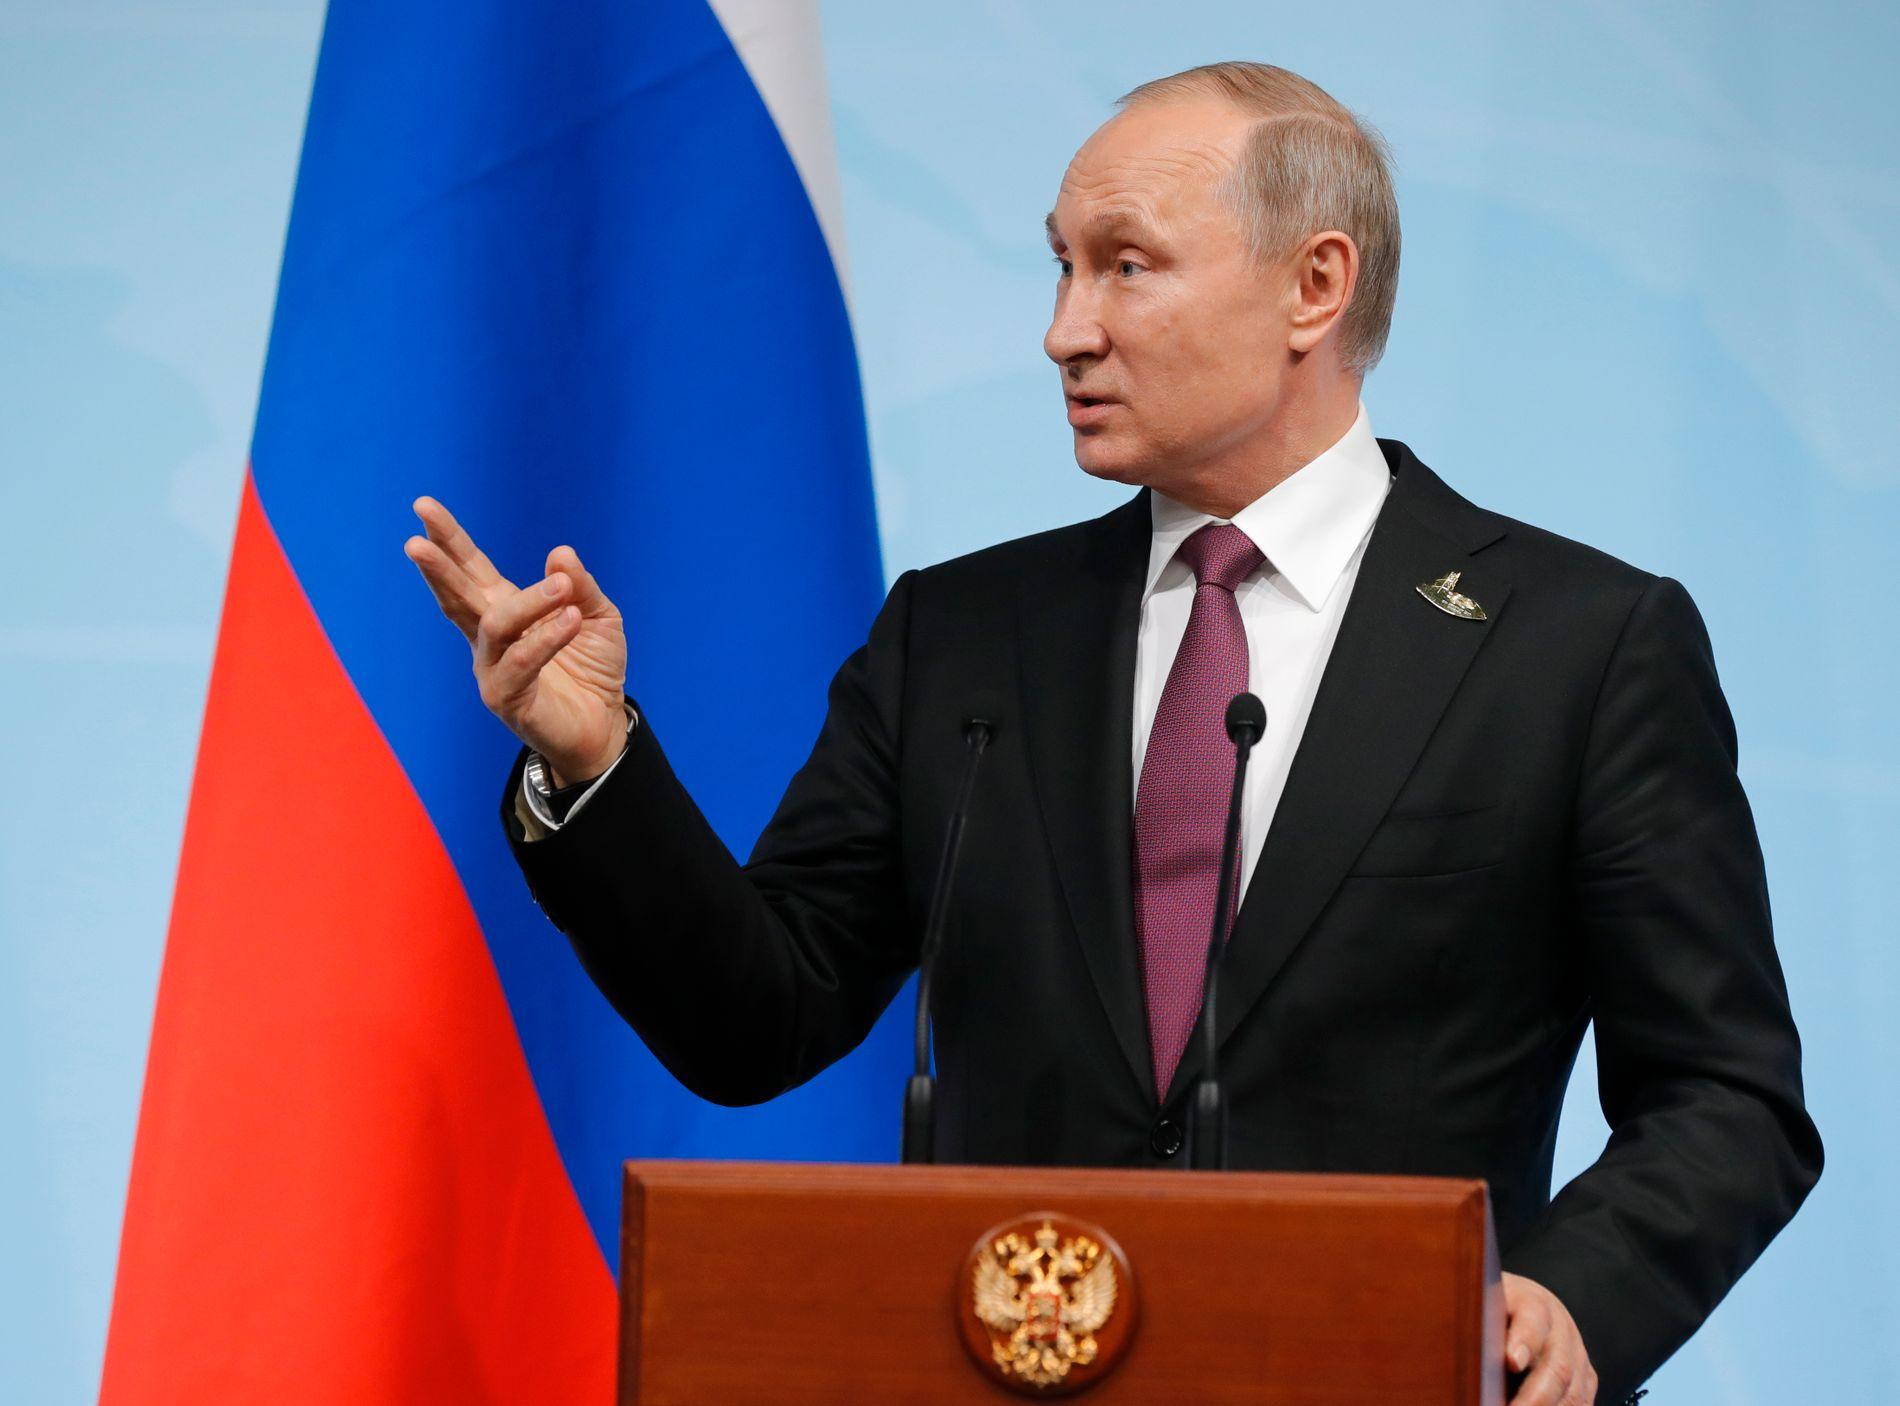 PRESSEKONFERANSE: Russlands president Vladimir Putin svarte pressen etter G-20 møtet i Hamburg.